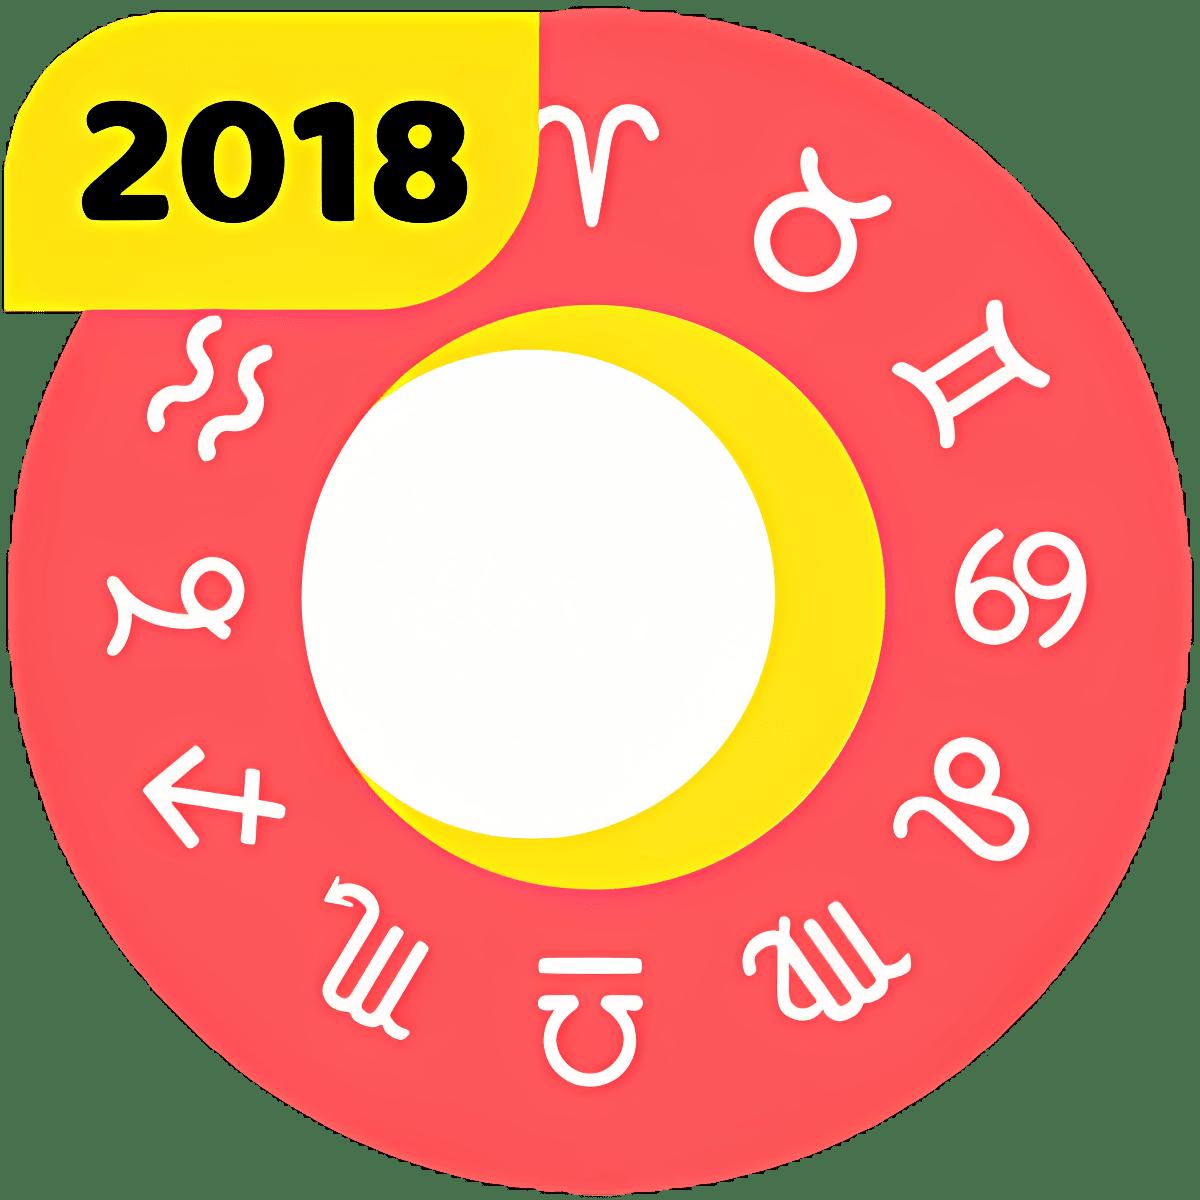 Zodiac Horoscope 101 - Astrology, Zodiac Sign 2018